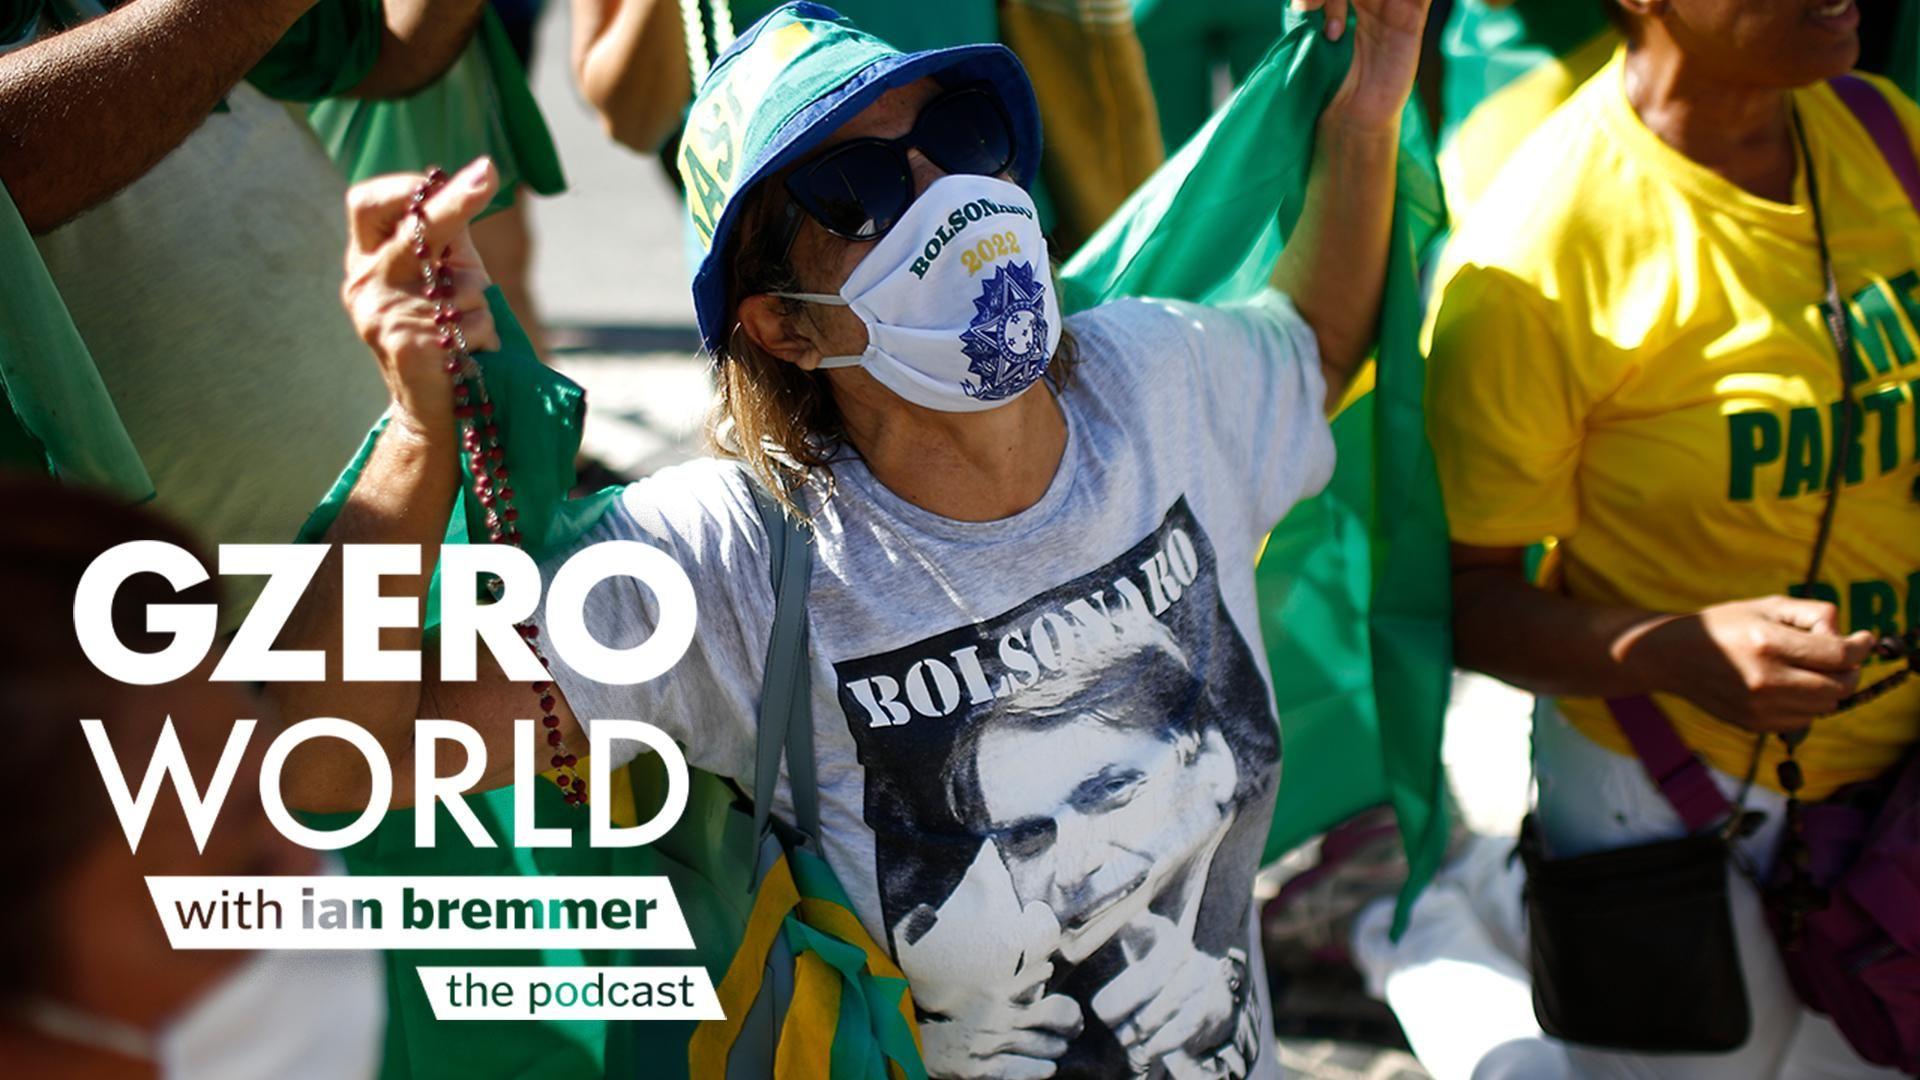 A Bolsonaro supporter in Brazil